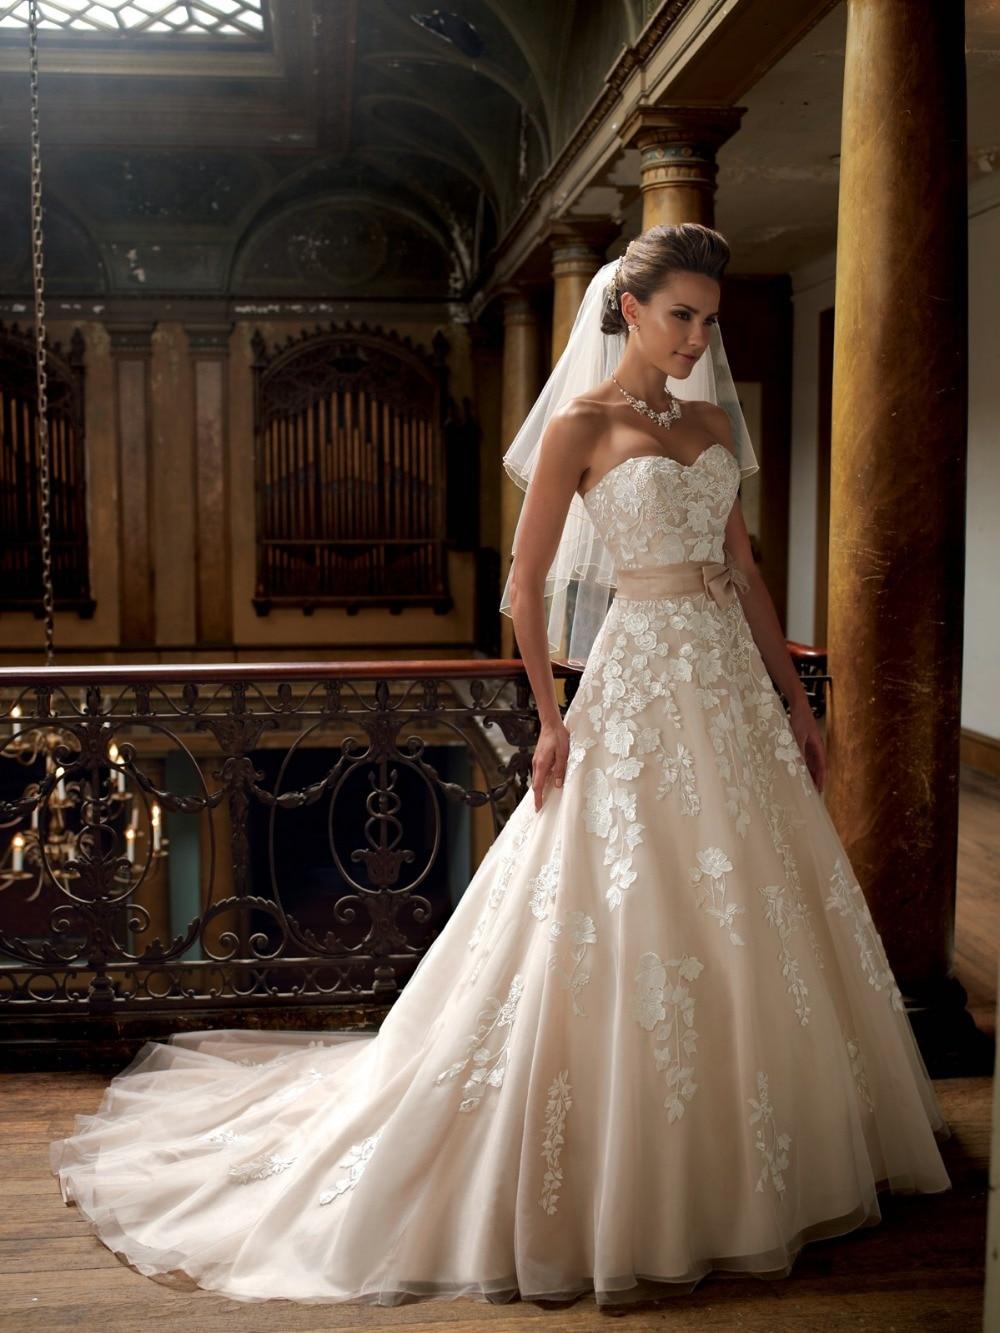 Medium Crop Of Champagne Wedding Dress